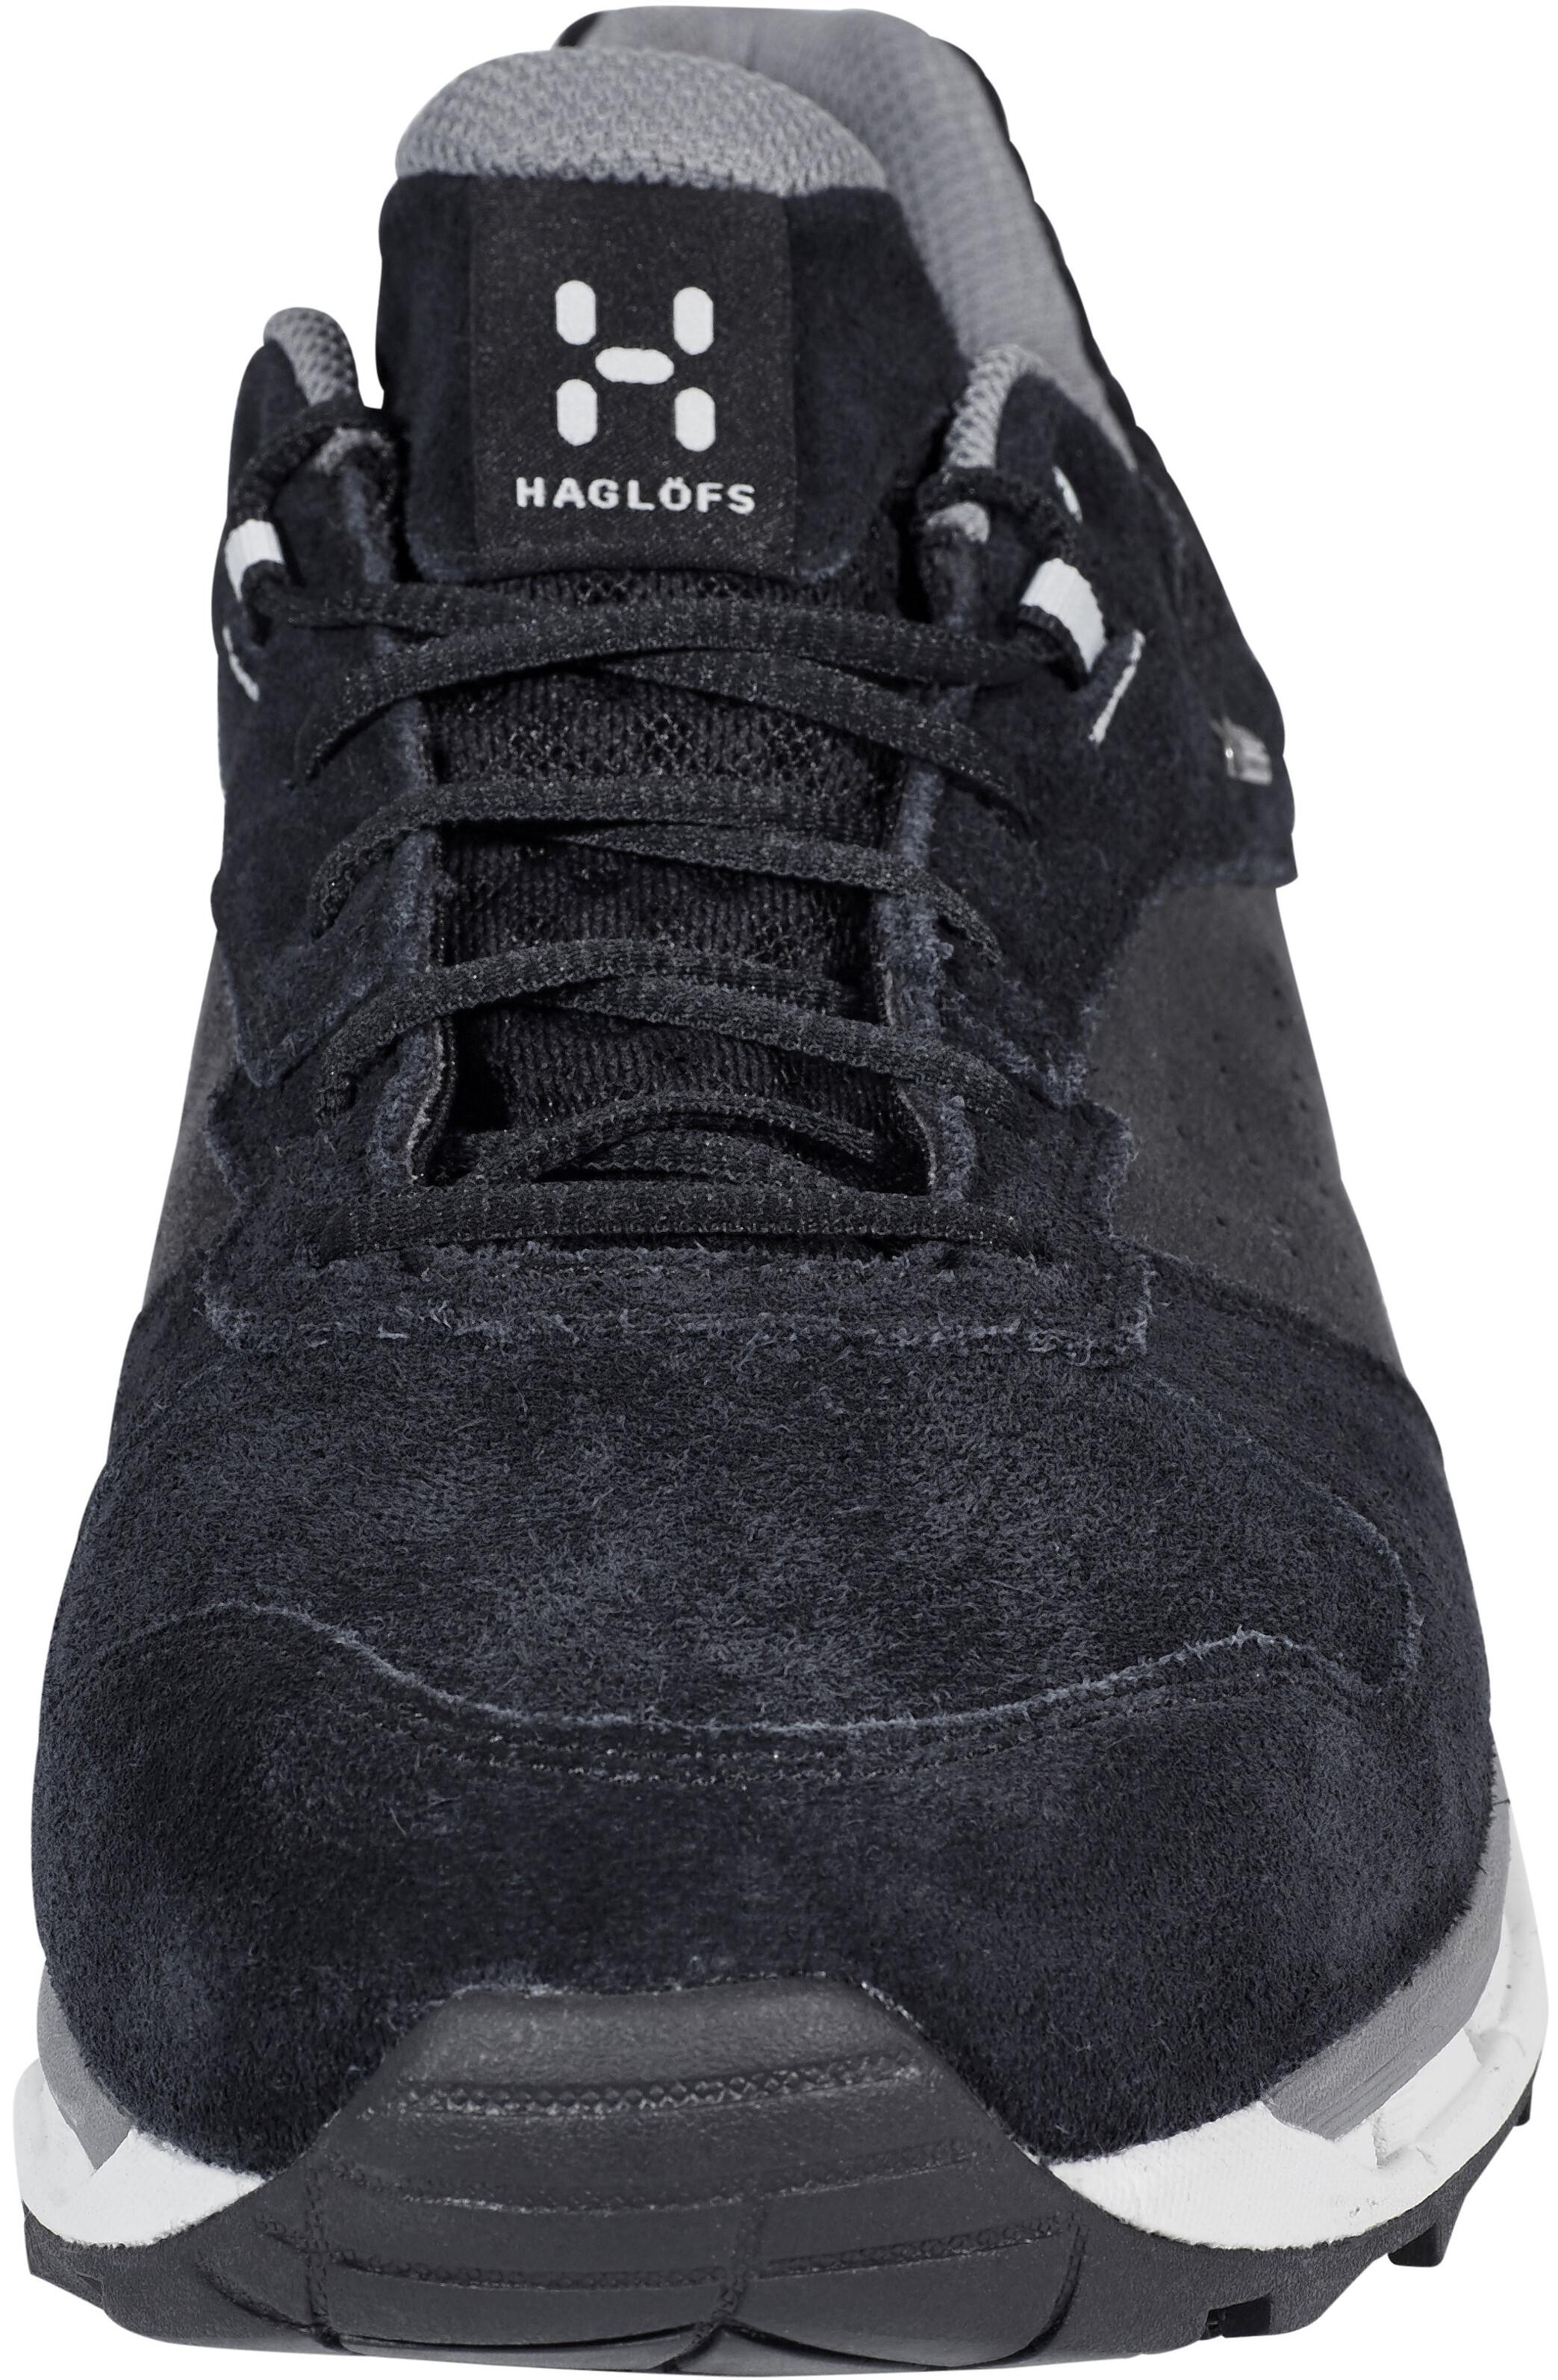 Haglöfs Explore GT Surround Shoes Men true black  00613bdca03